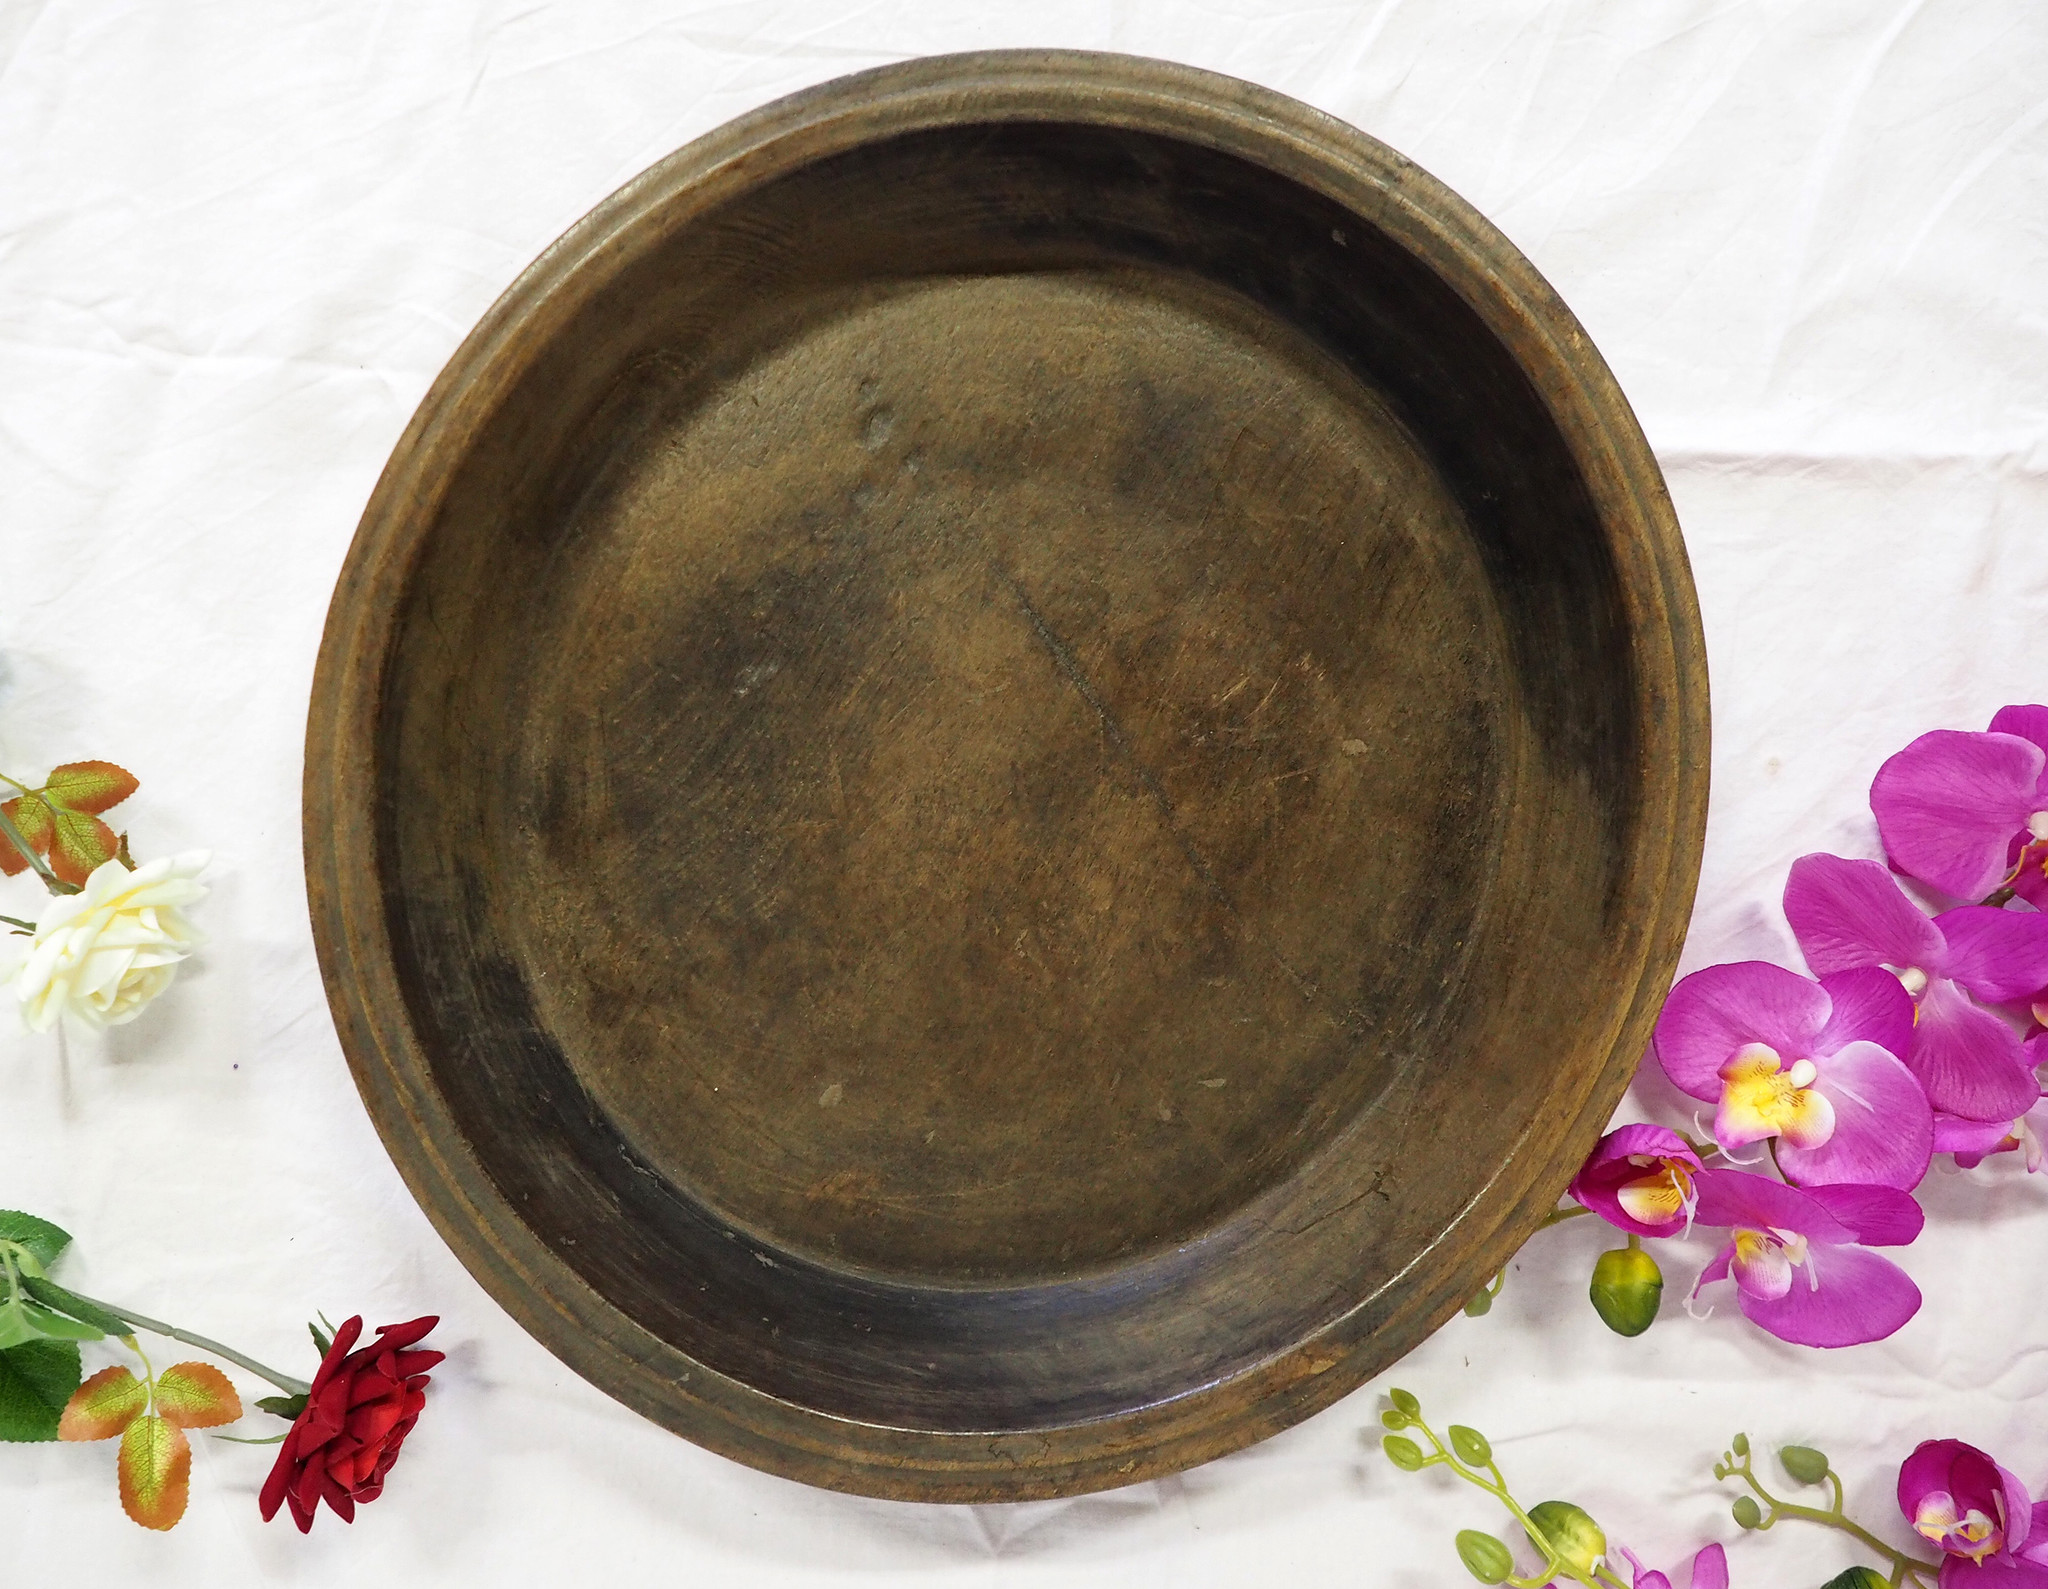 antik orient Holz Tablett teller Antique wooden tray Nuristan Afghanistan ulm/A